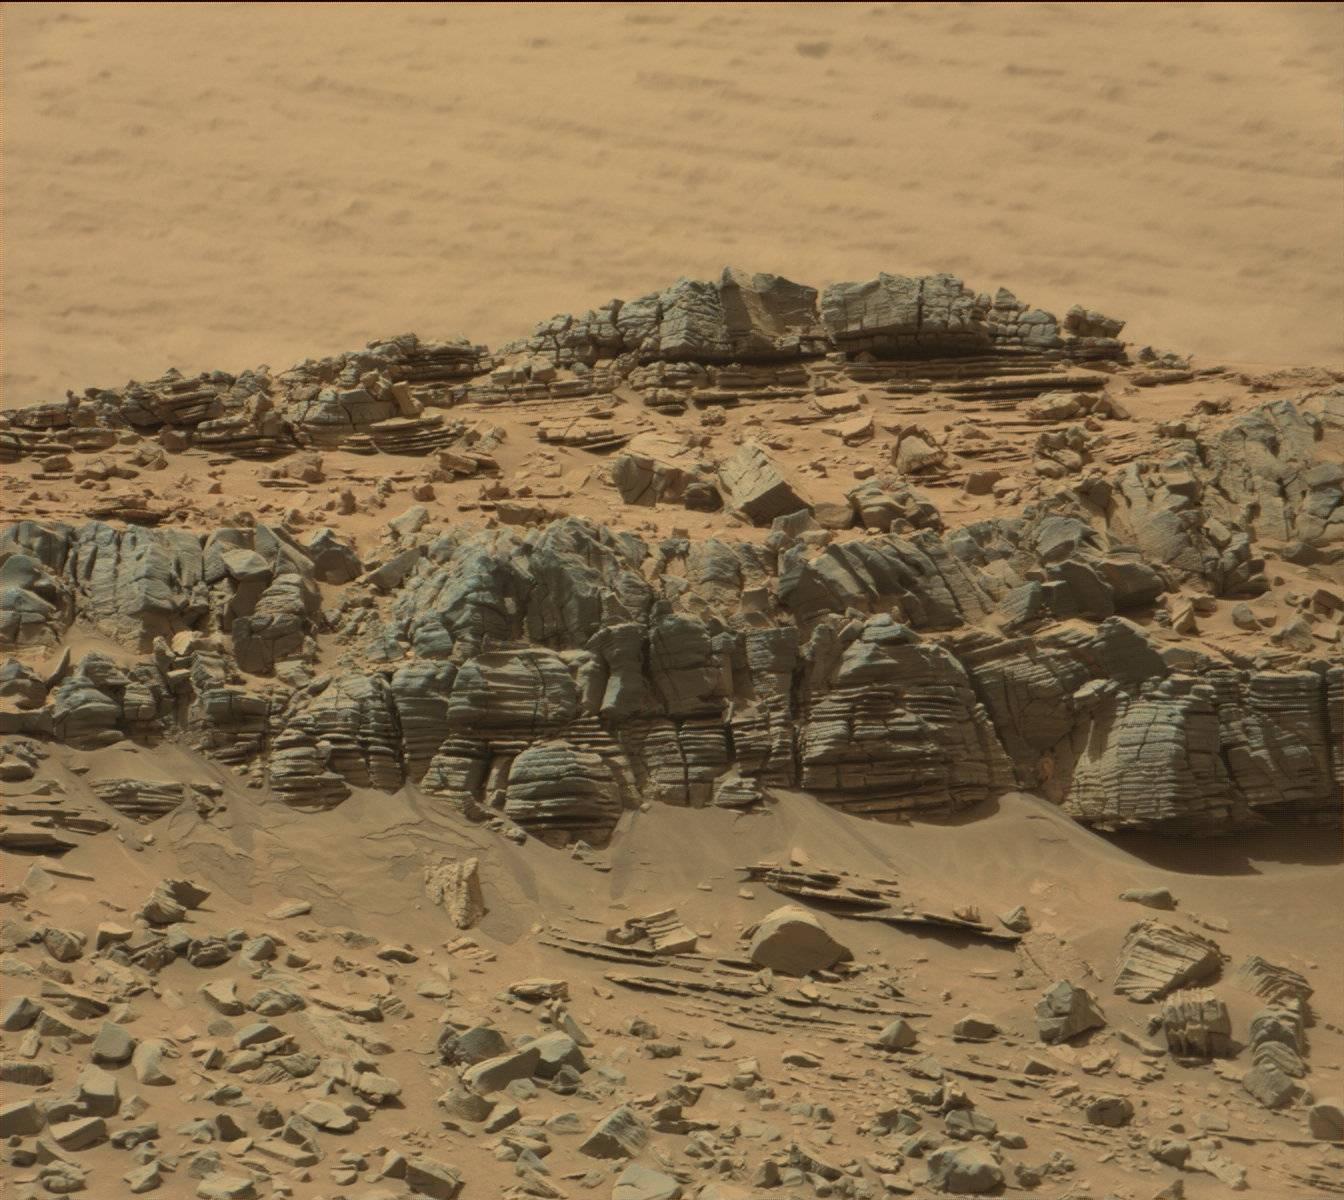 mars curiosity unexplained - photo #15